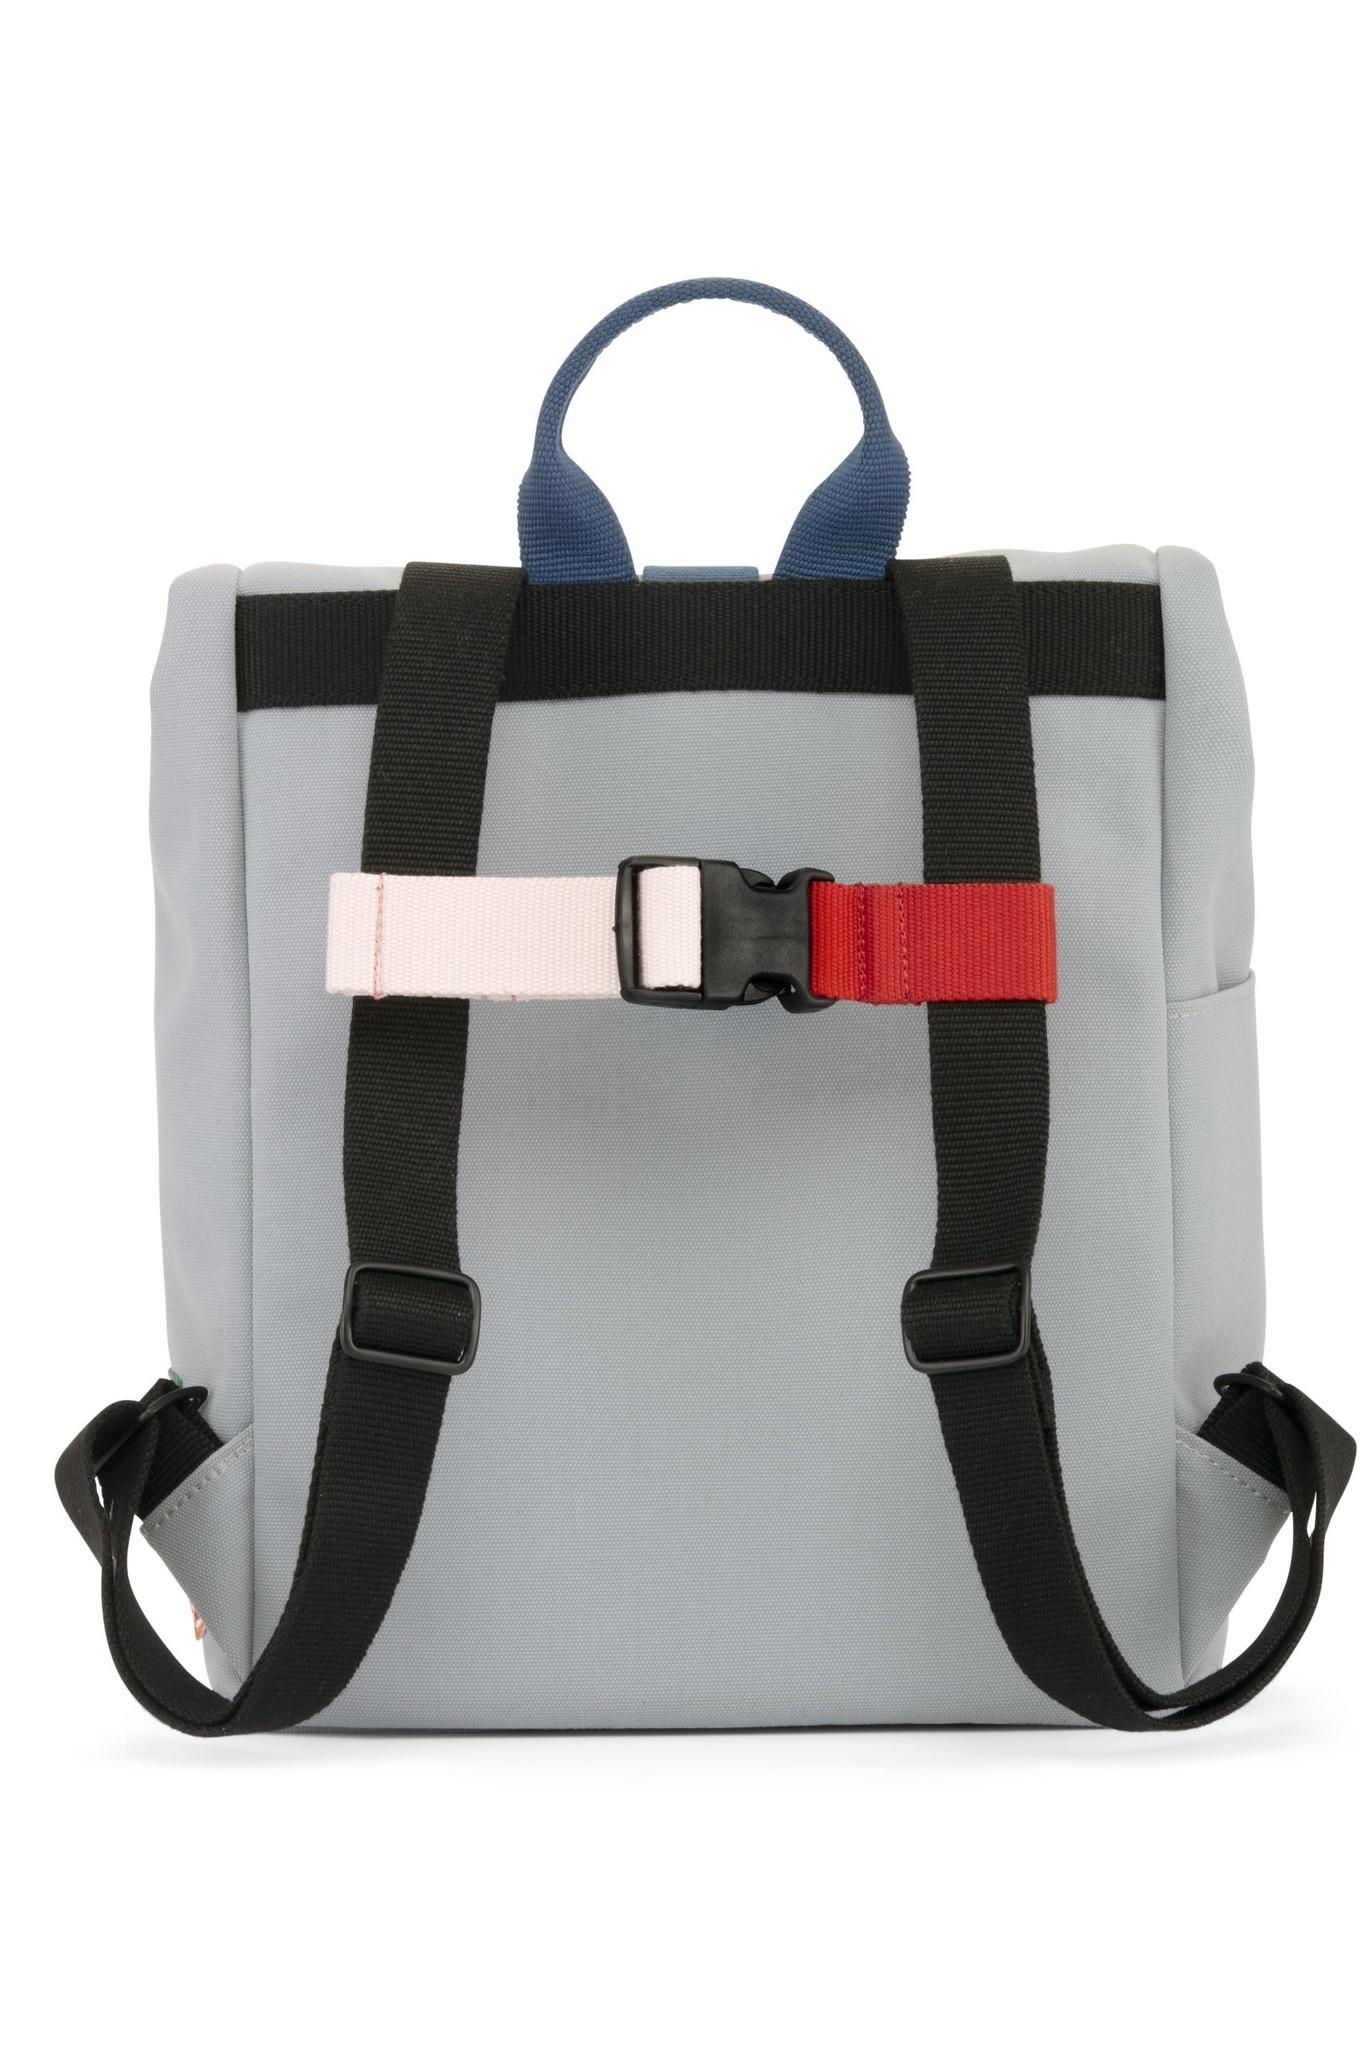 Mini Bag - Cloud grey / Ocean Blue-3